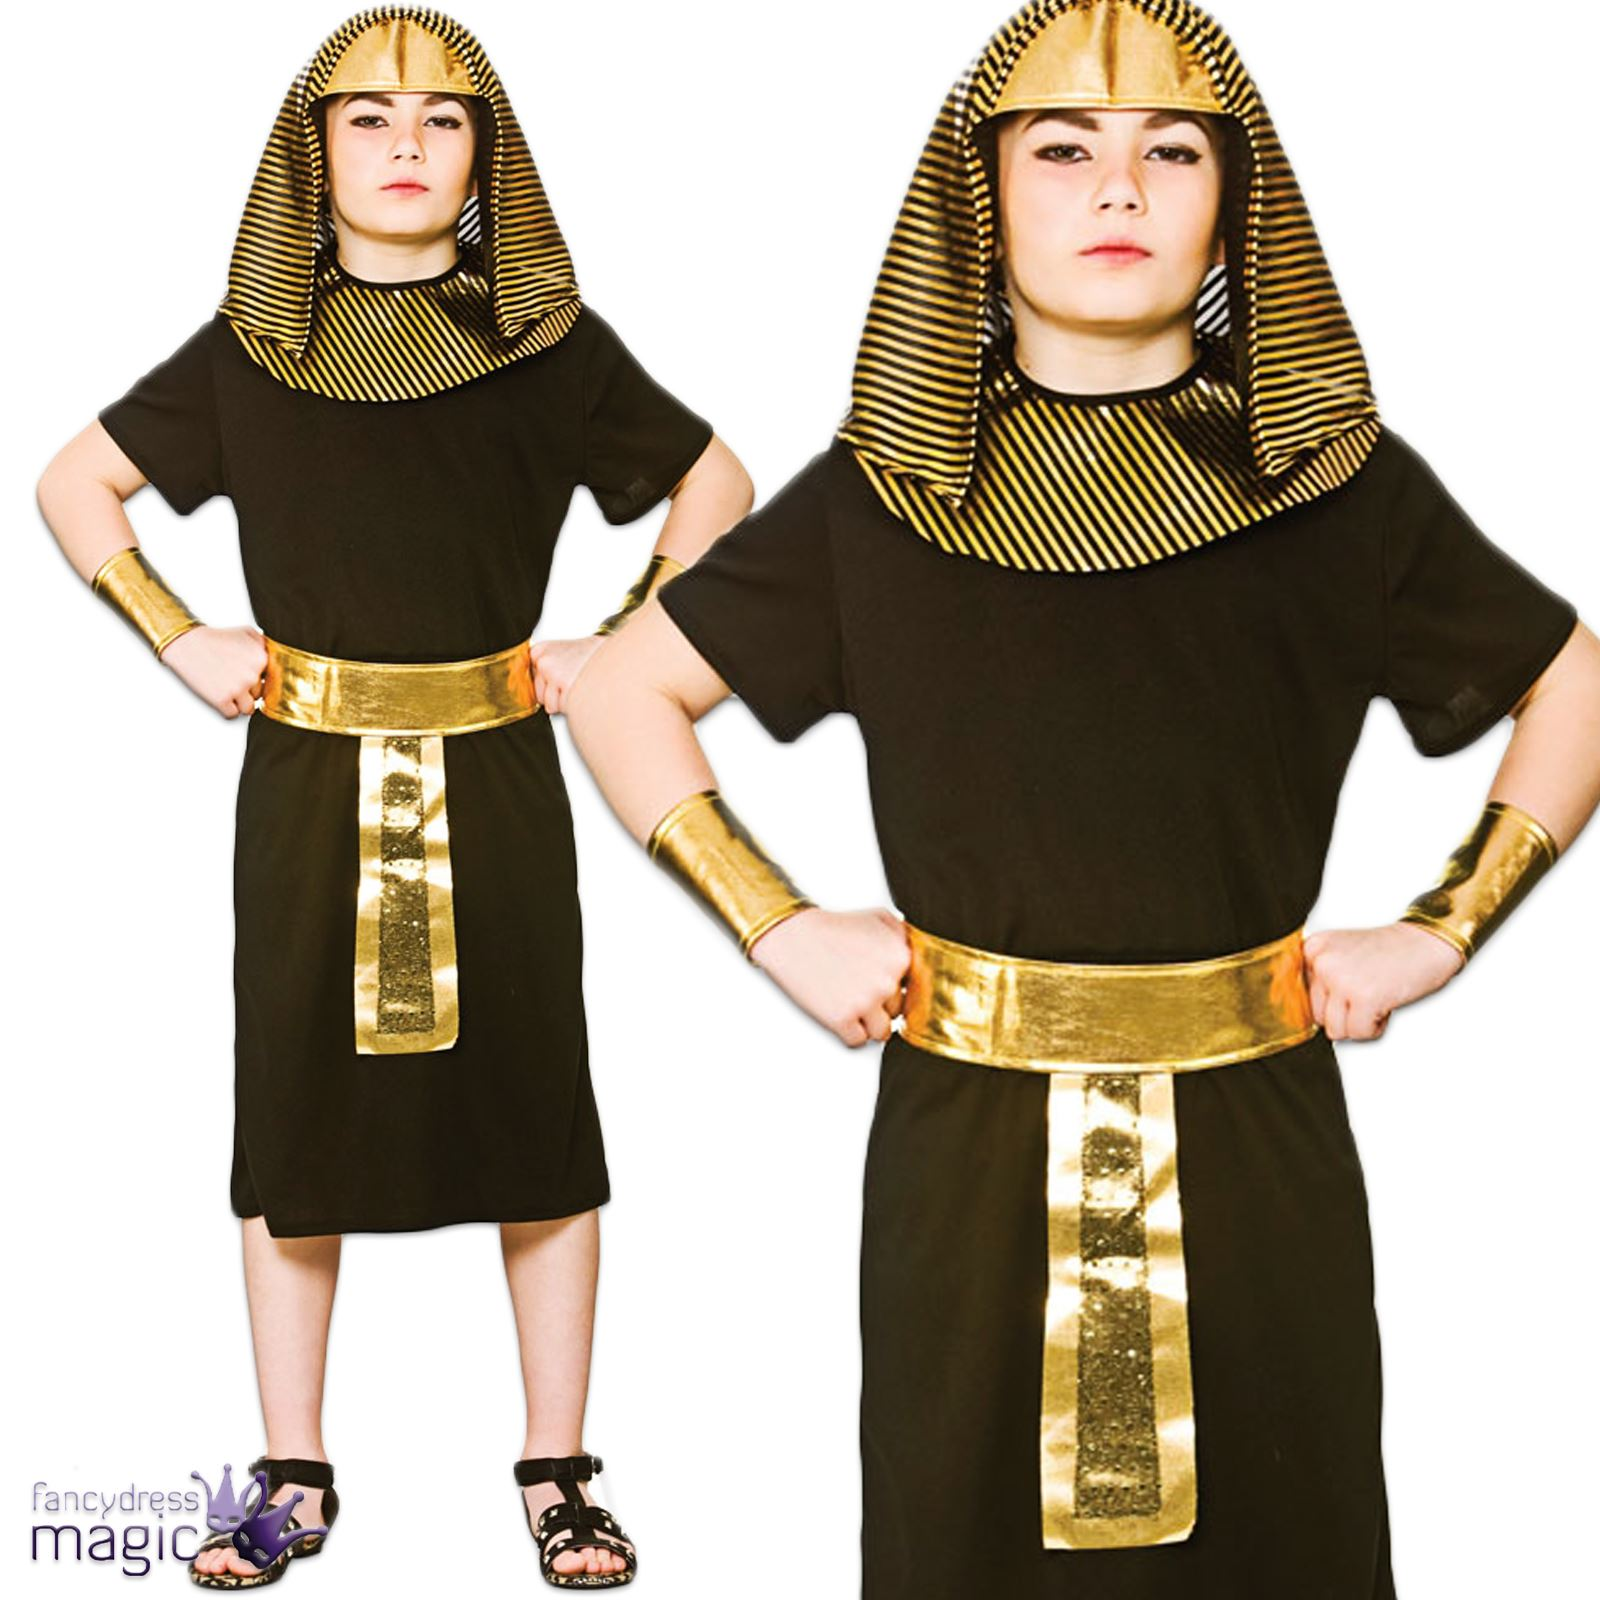 jungen kinder gyptisch historisches gypten k nig pharao kost m kleid outfit ebay. Black Bedroom Furniture Sets. Home Design Ideas